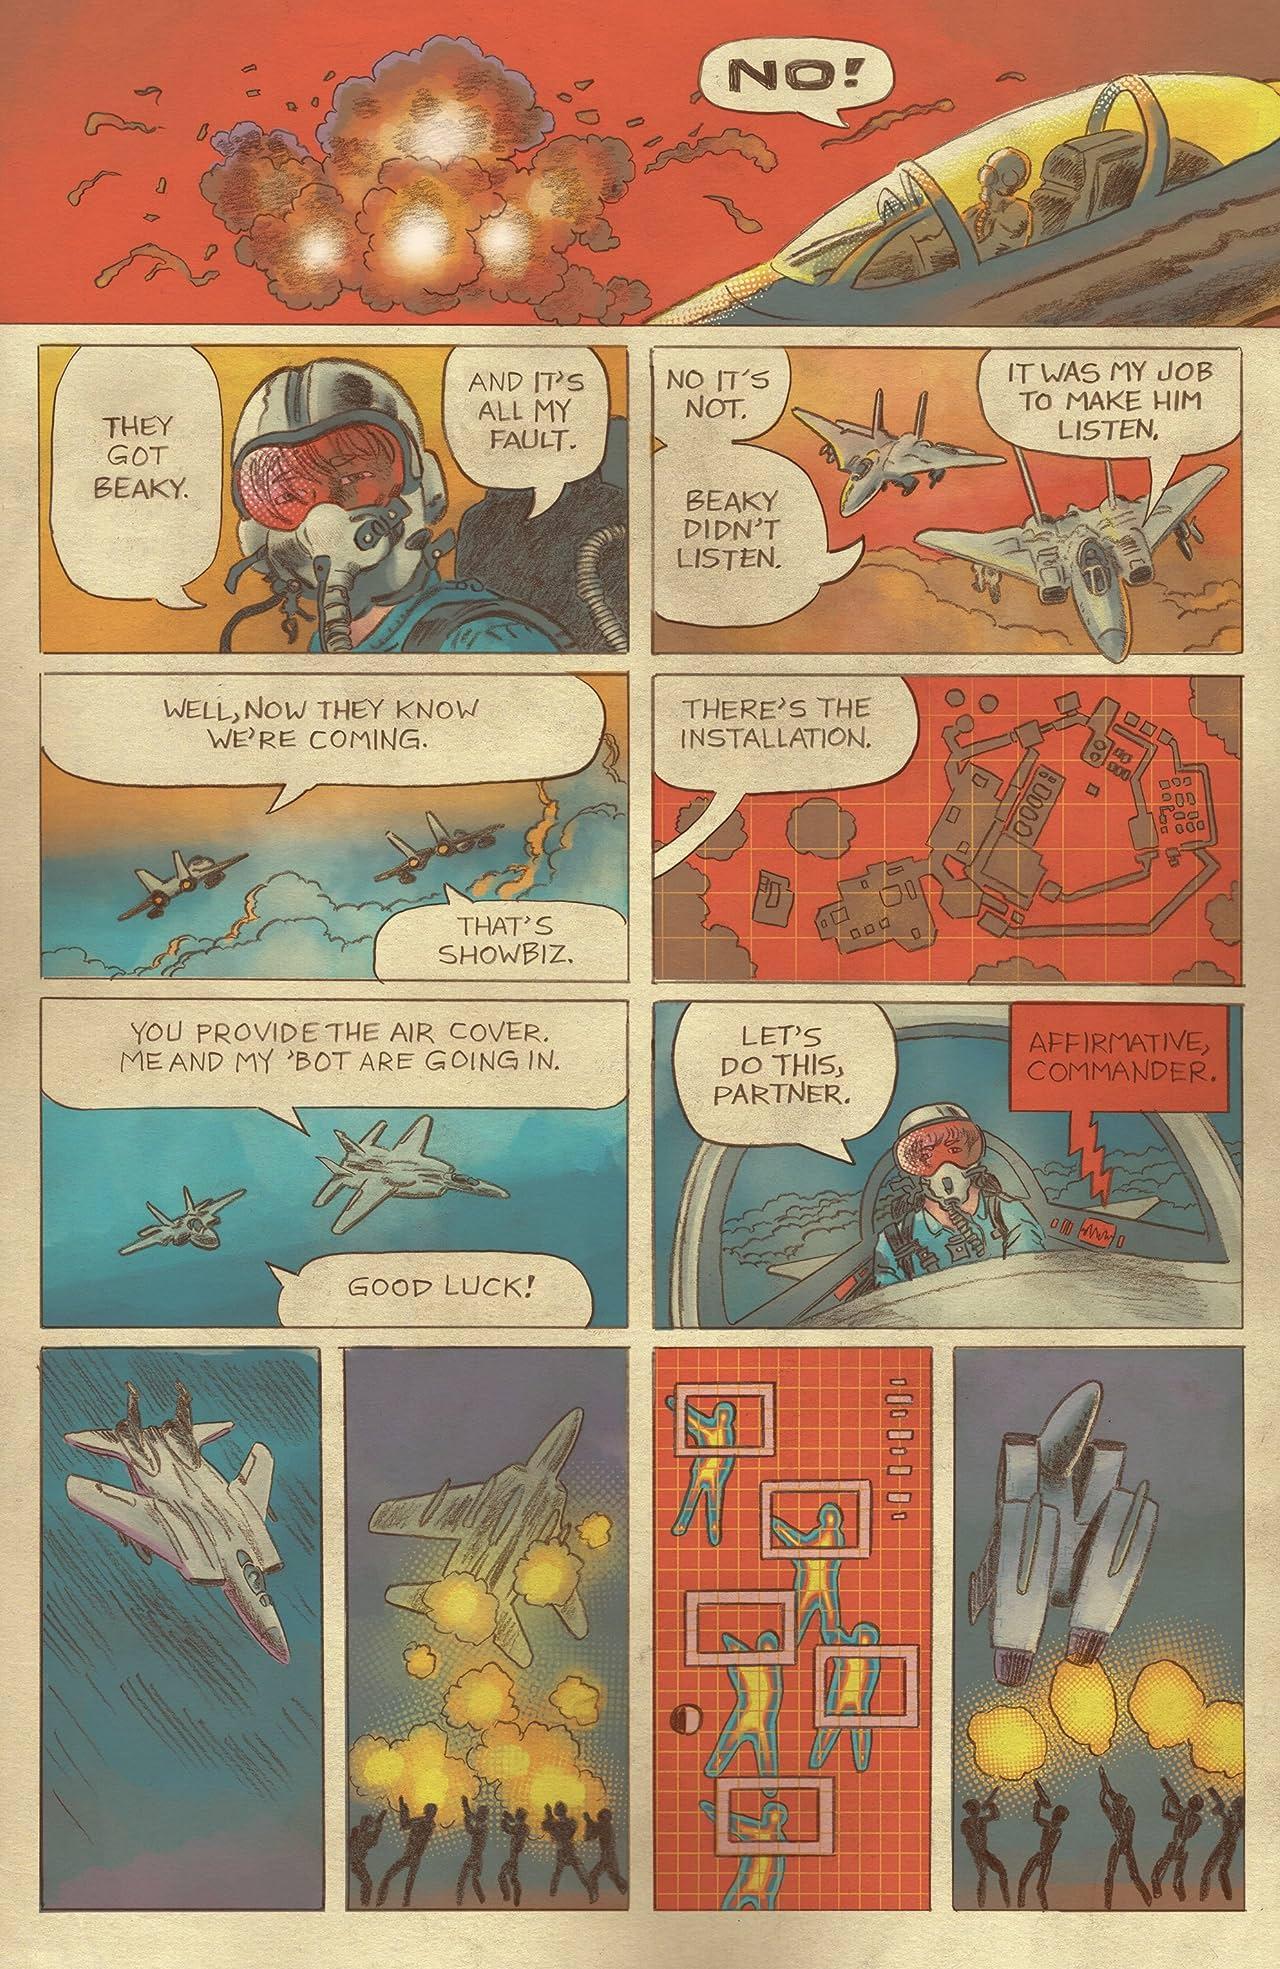 Go-Bots #1